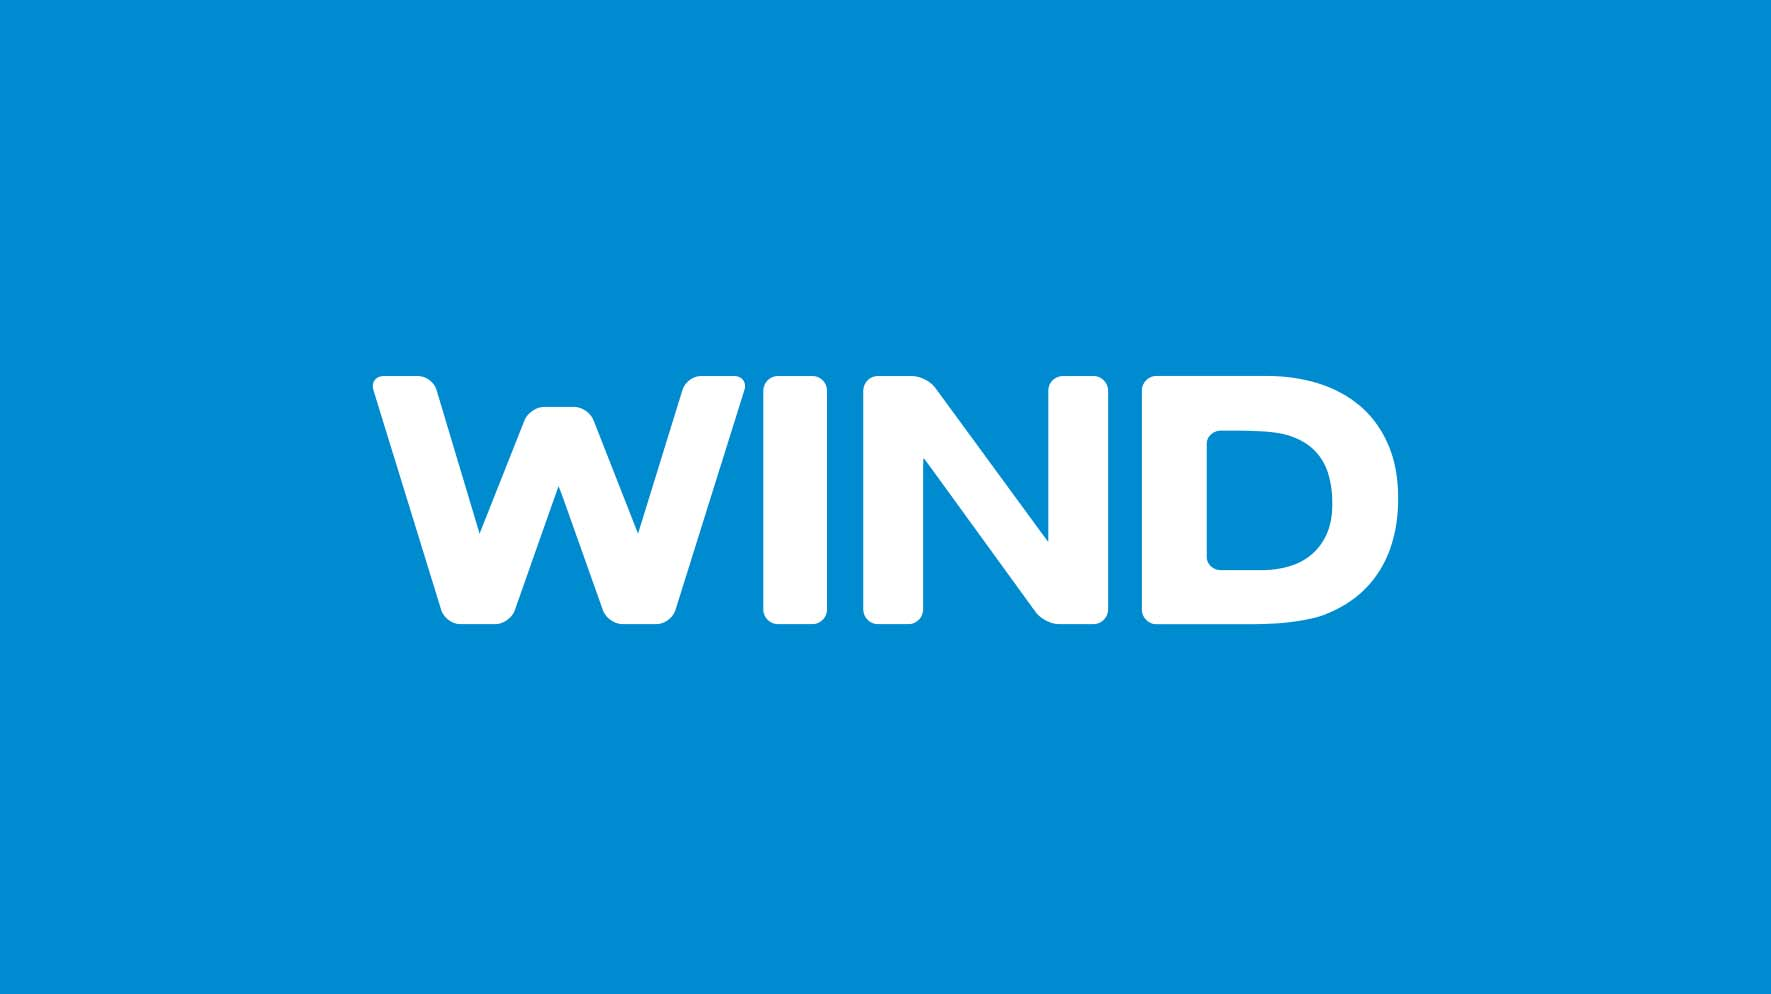 WIND: Δωρεάν επικοινωνία για τους συνδρομητές σε Λάρισα και Ελασσόνα